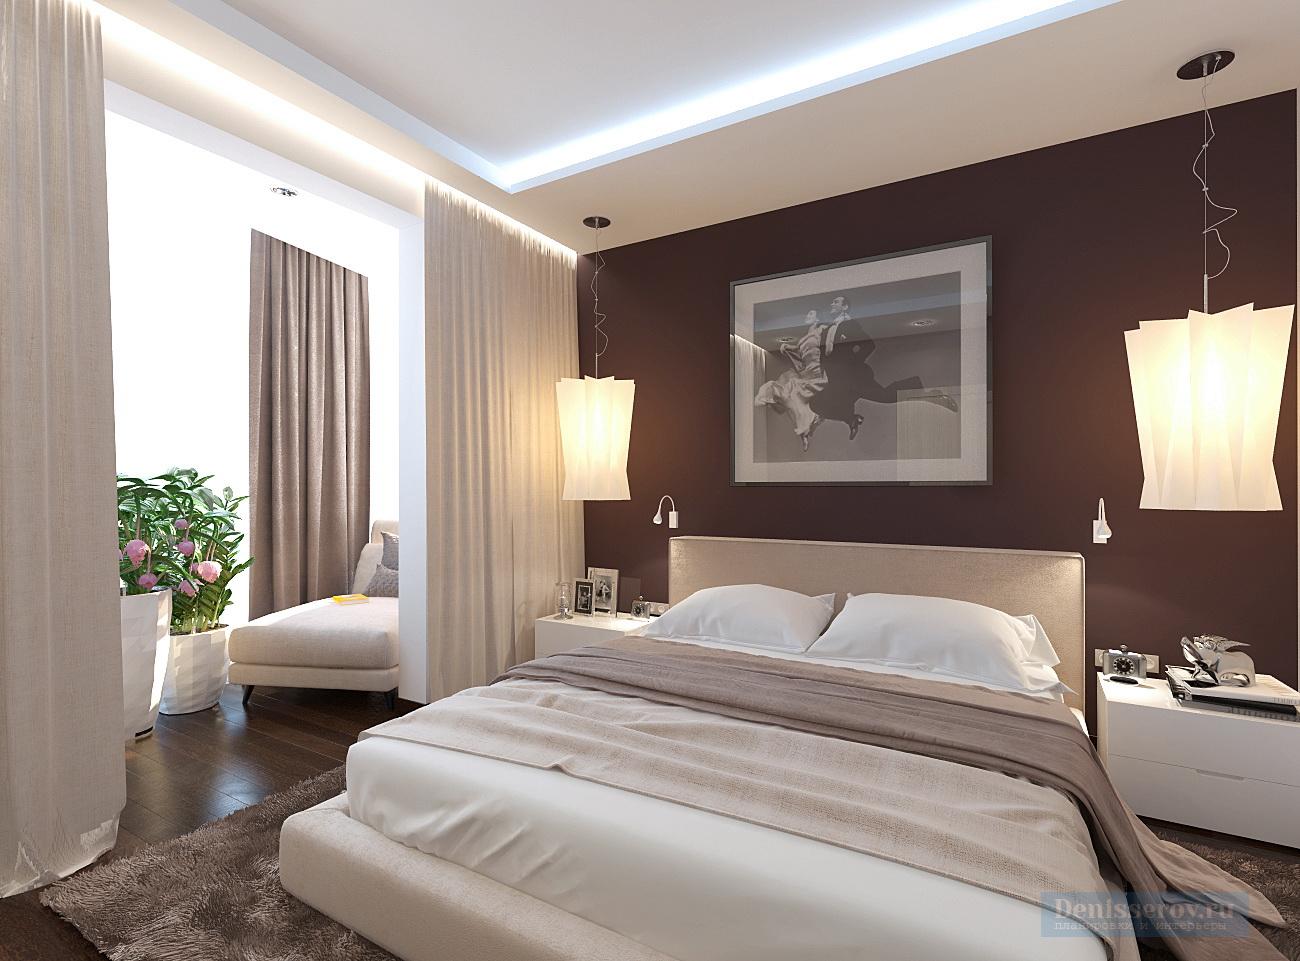 Proekt-dizajn-spalni-17-kv-m-v-stile-minimalizm-4